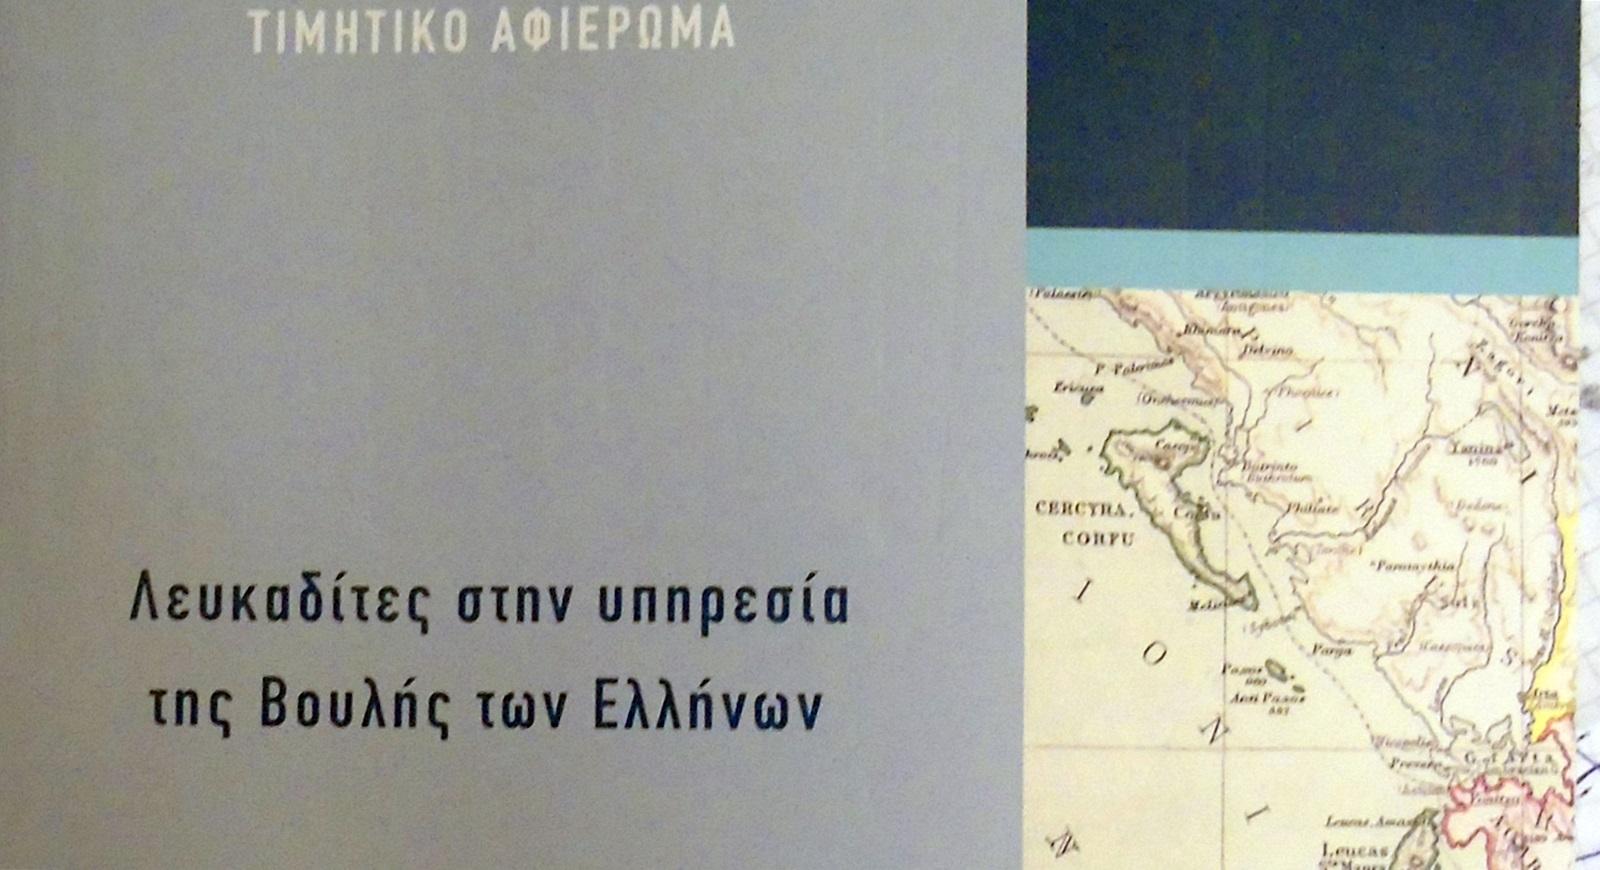 timitiko_afieroma_vouli_Lefkadites 2